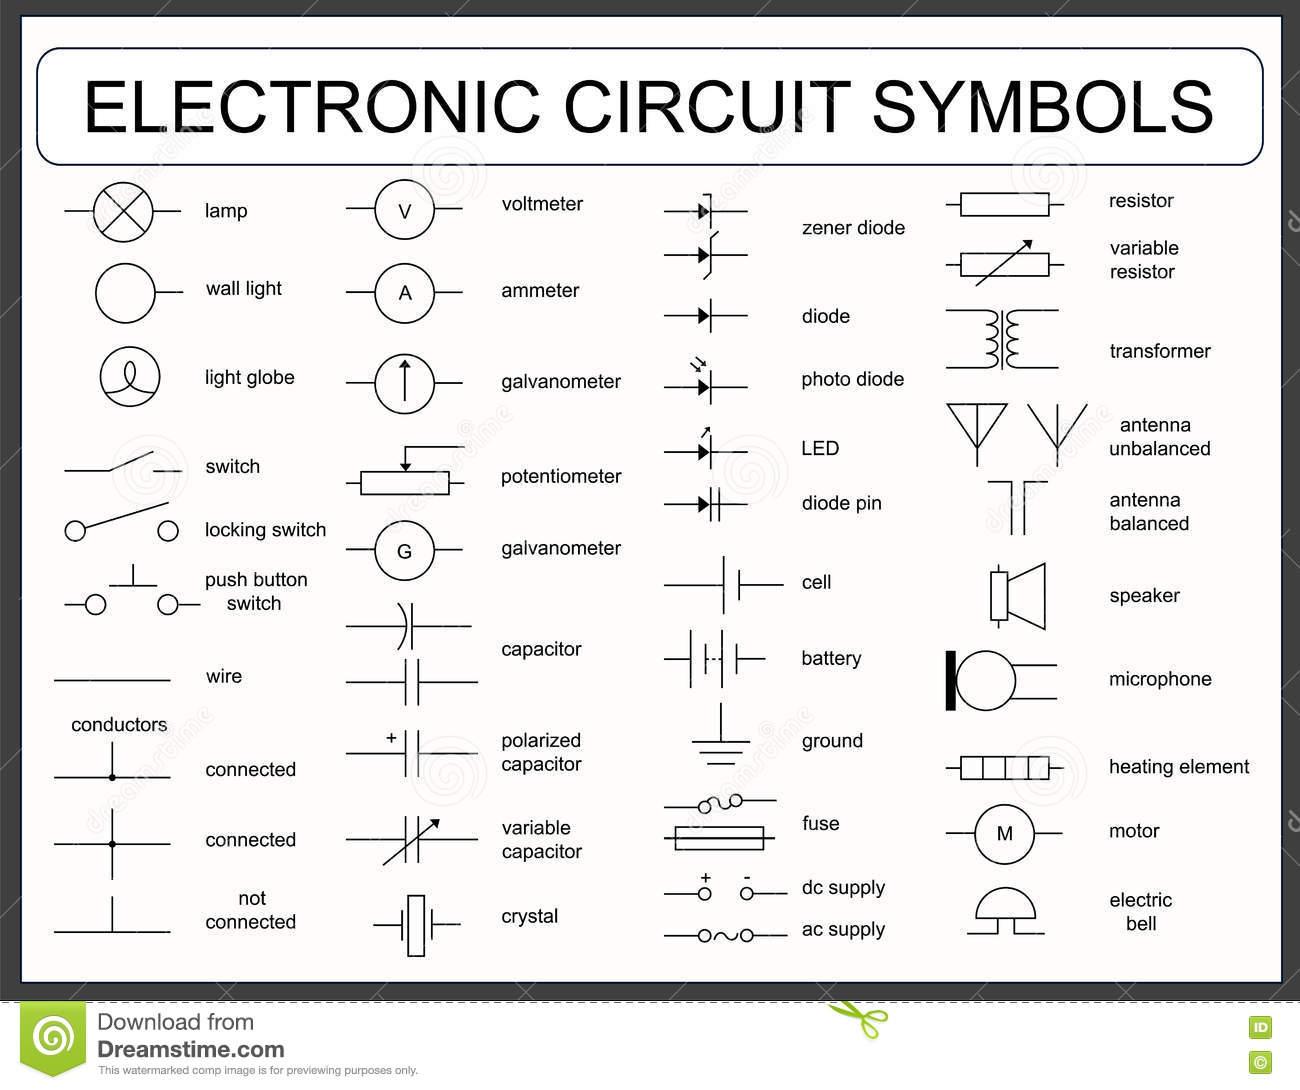 ZV_4534] Electronic Circuit Symbol Wiring DiagramFlui Oupli Drosi Onica Mentra Minaga Subd Ropye Hete Inama Mohammedshrine  Librar Wiring 101